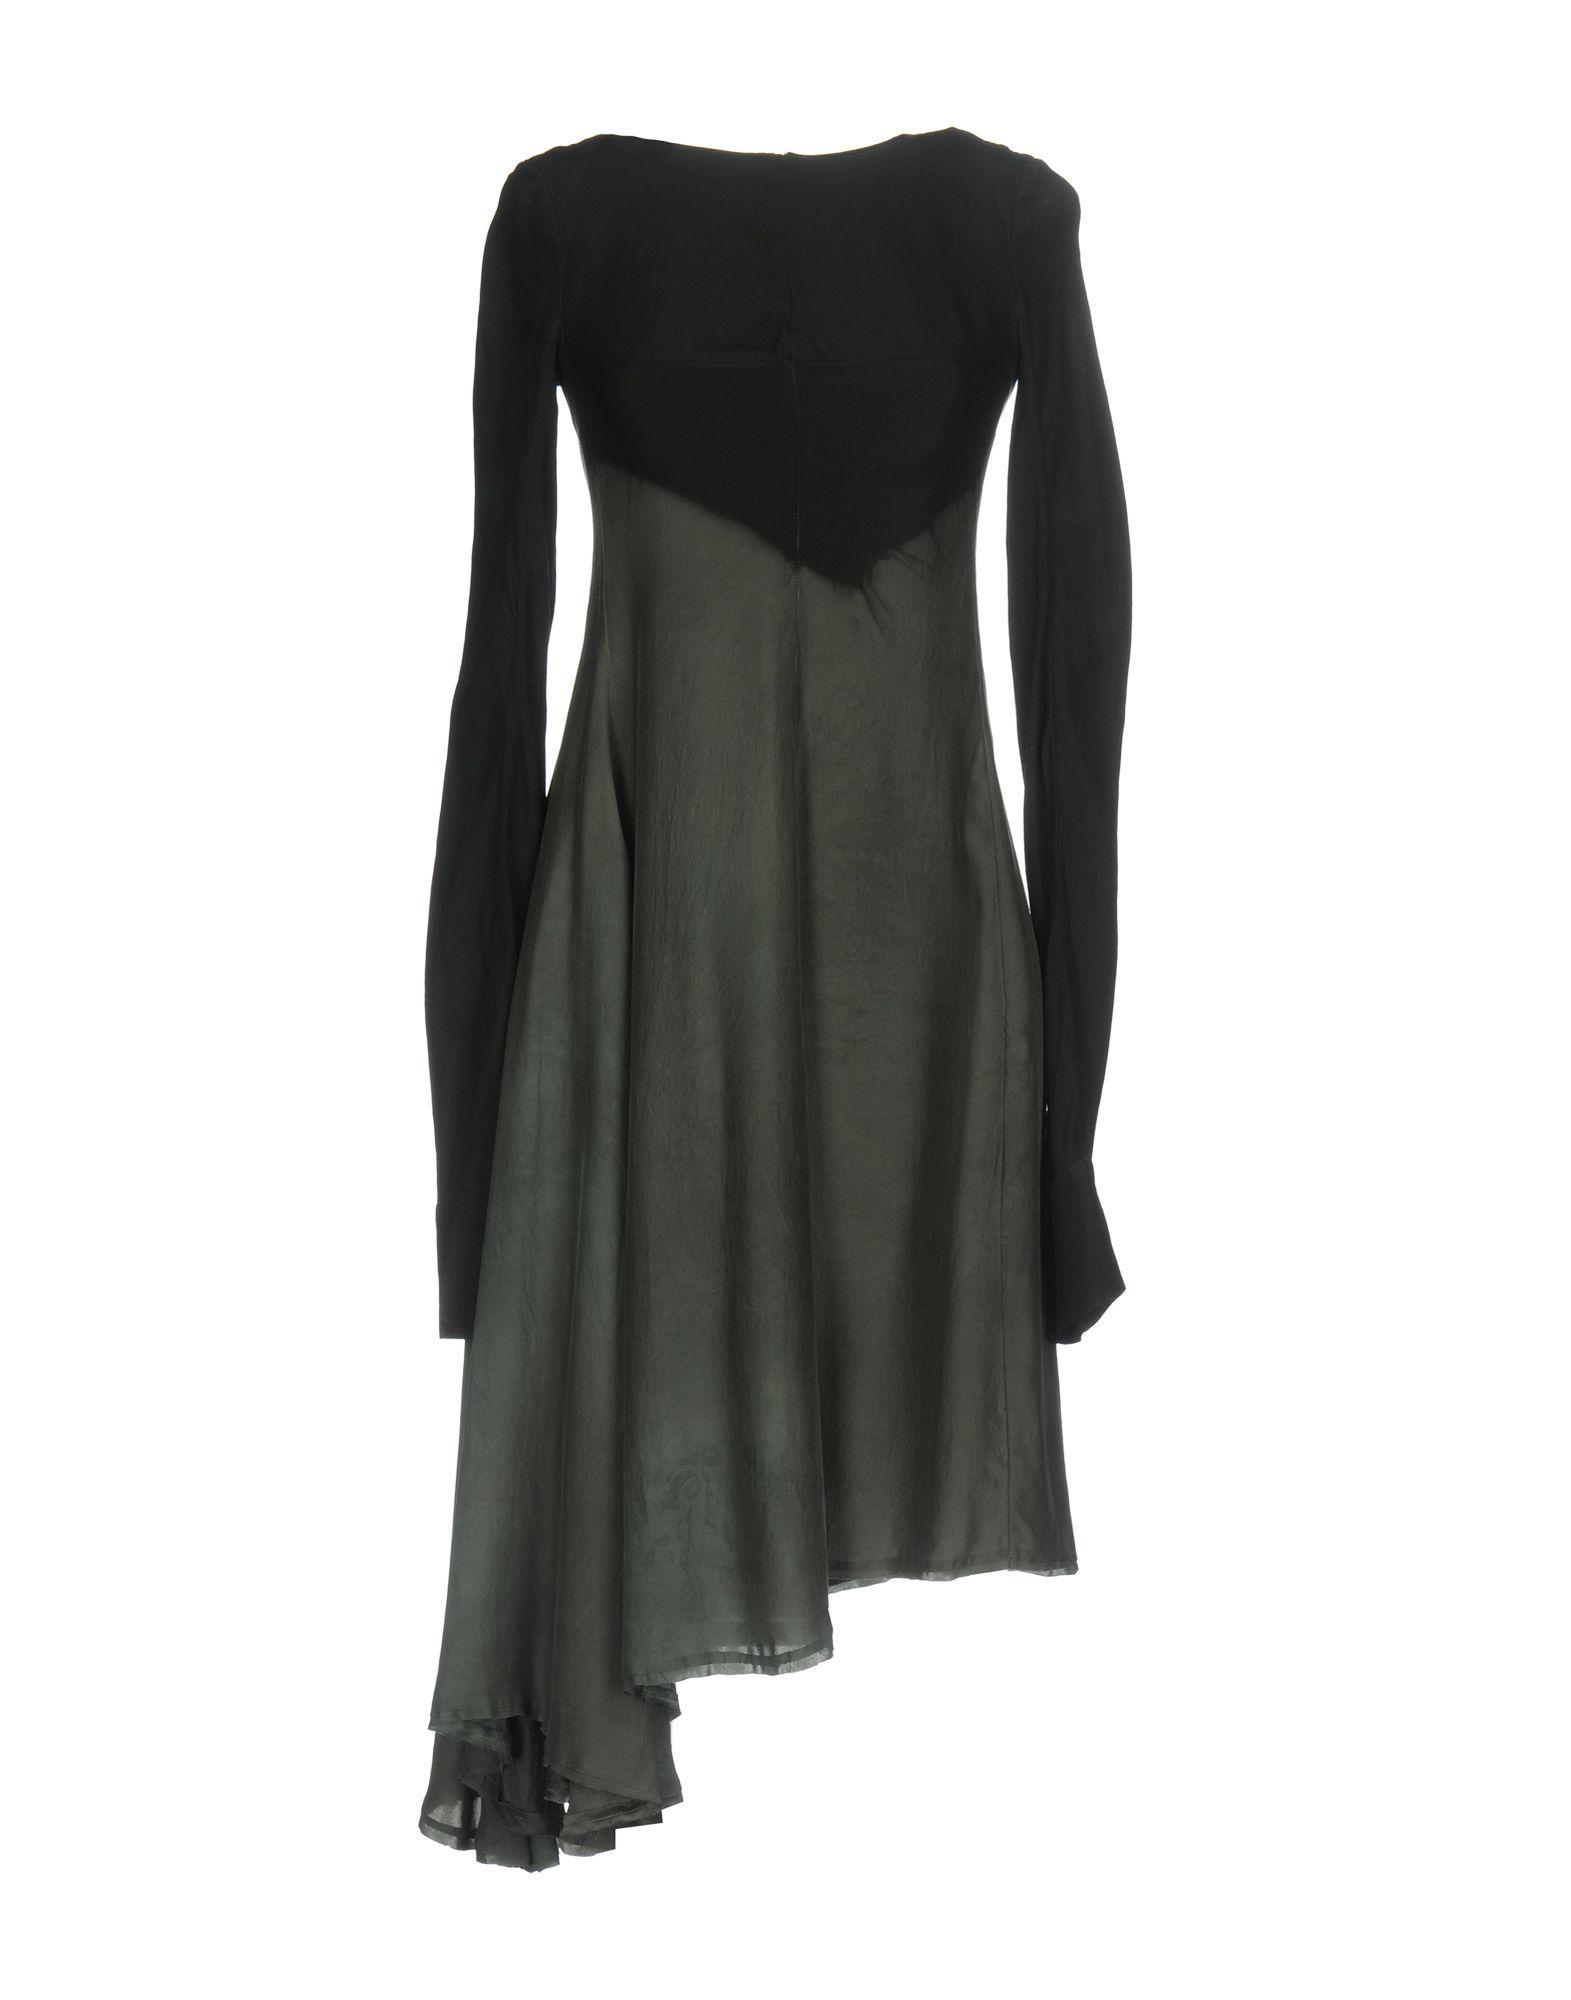 DRESSES - Knee-length dresses Marc Le Bihan AtIvSL